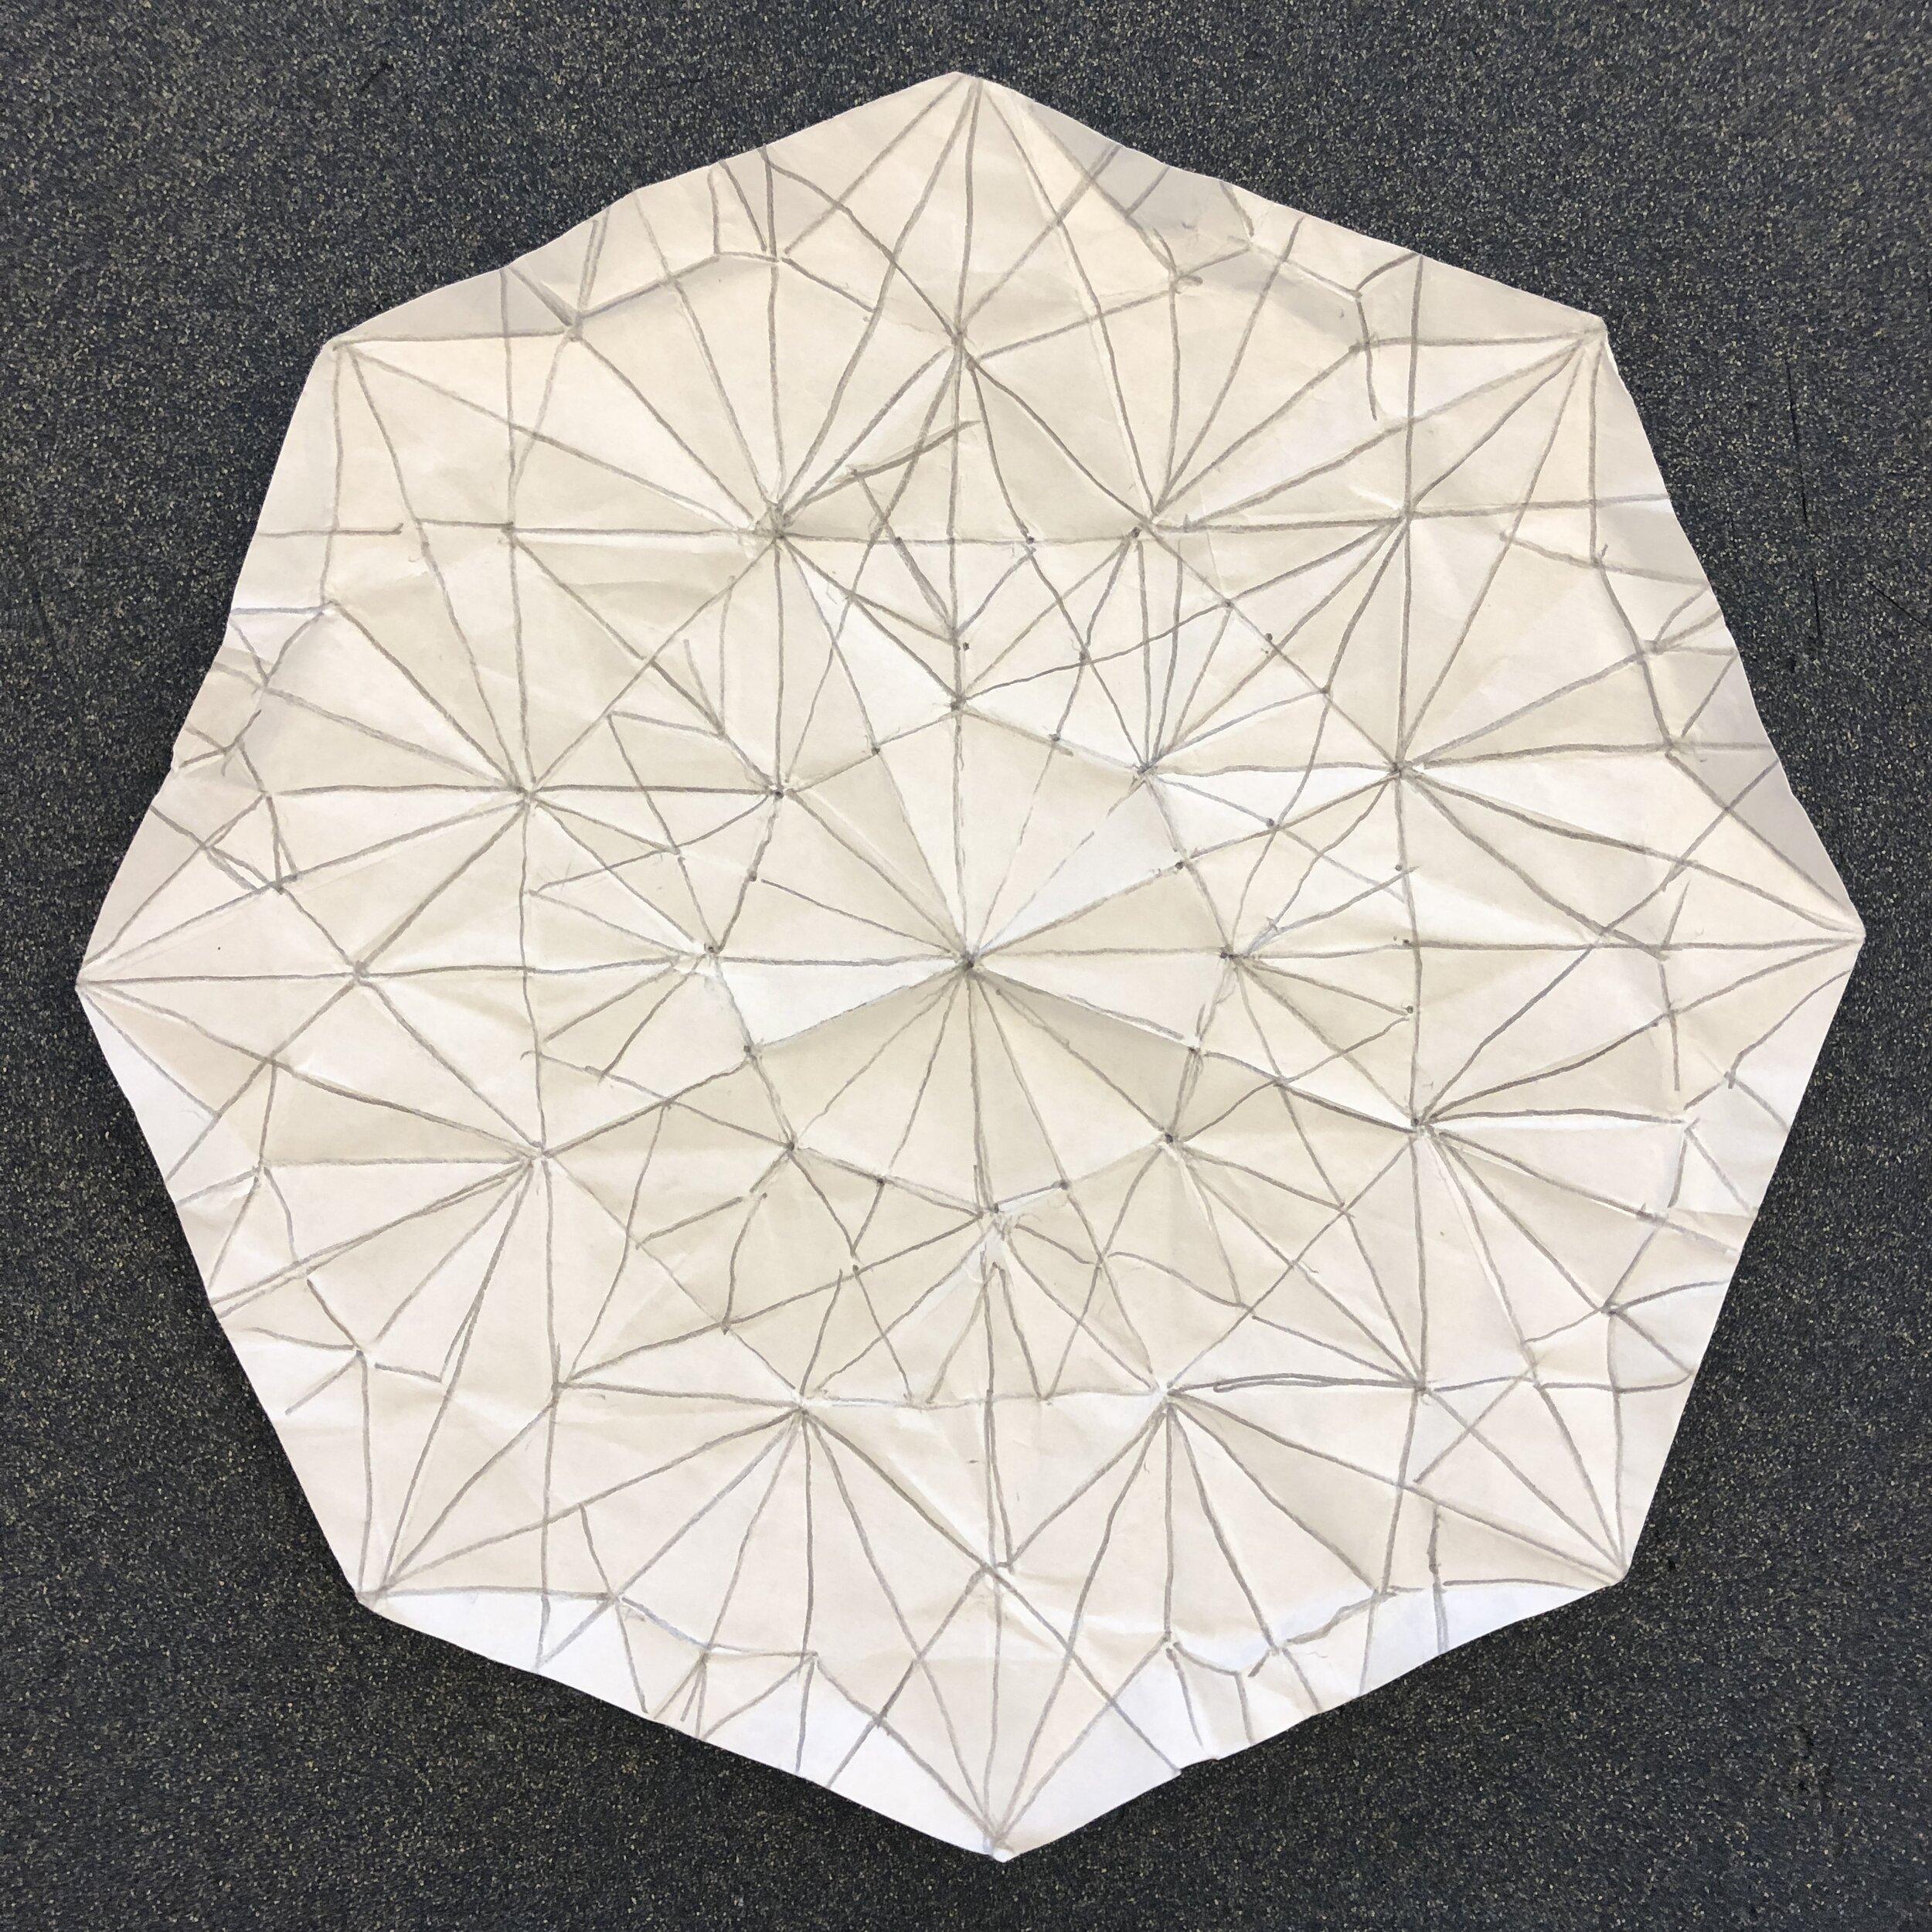 Crease pattern, eight-pointed chrysanthemum mock. New York City, September 2019